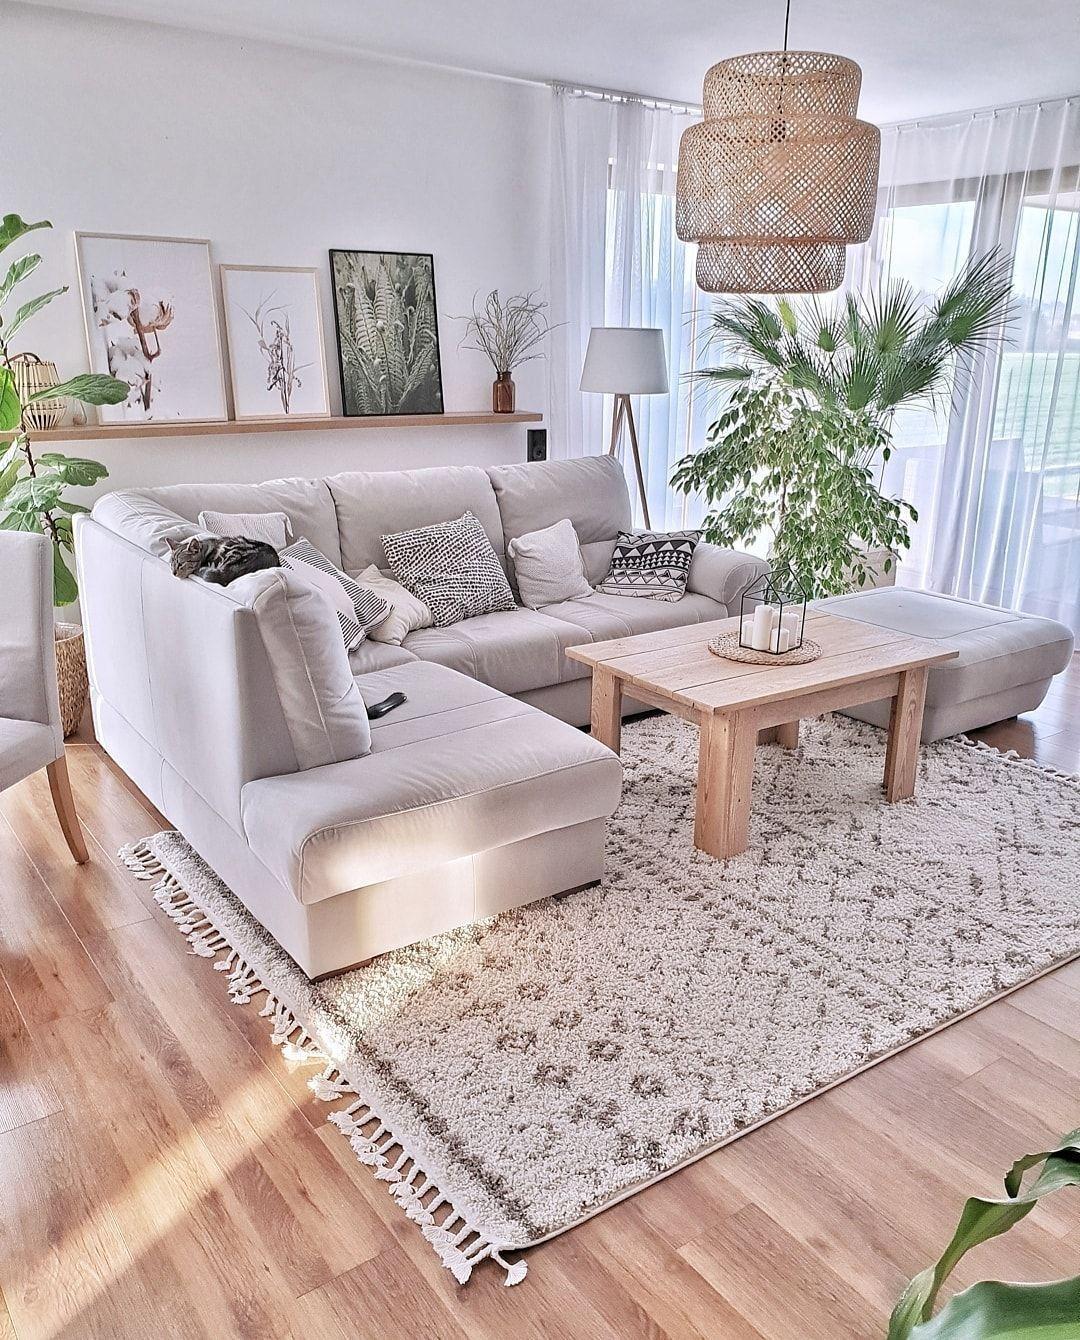 "homedecor HOME DECOR &038; DESIGN on Instagram ""Here is your Sunday&;s inspiration! 🤗…"